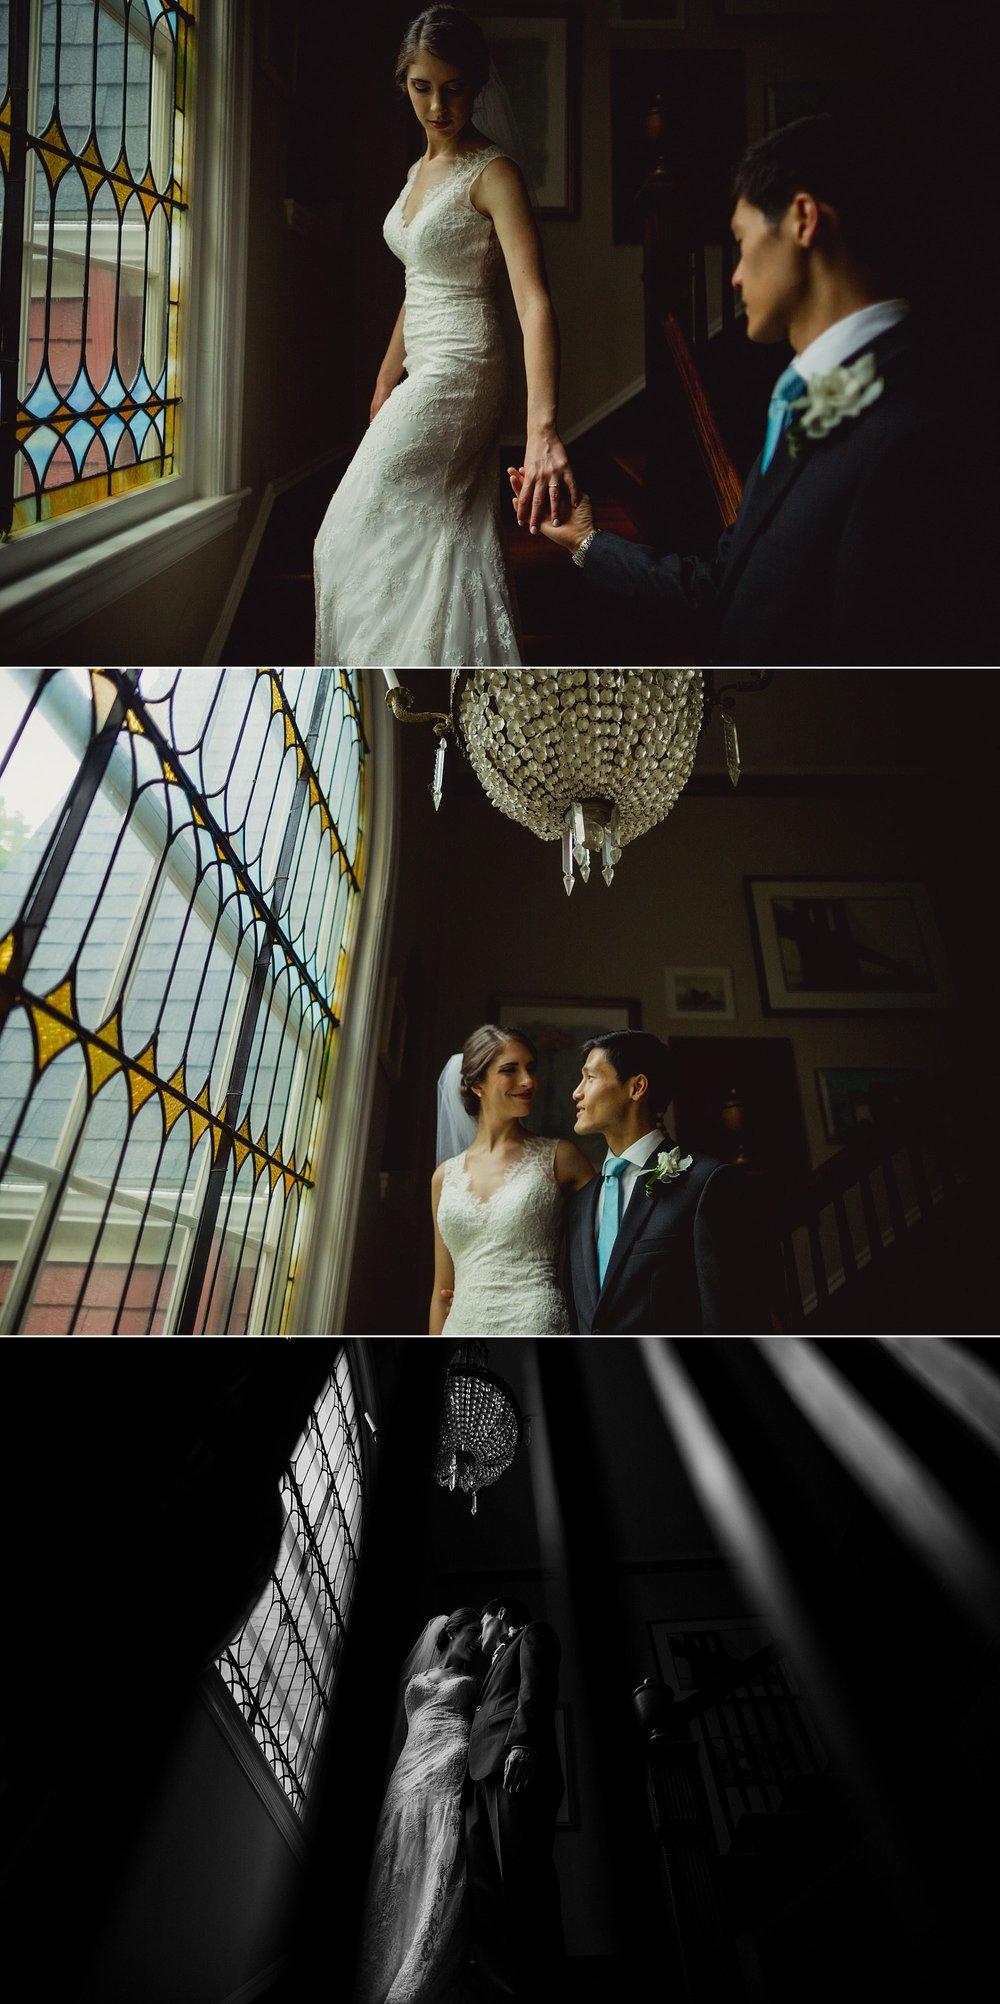 Venezia wedding Boston-27.jpg